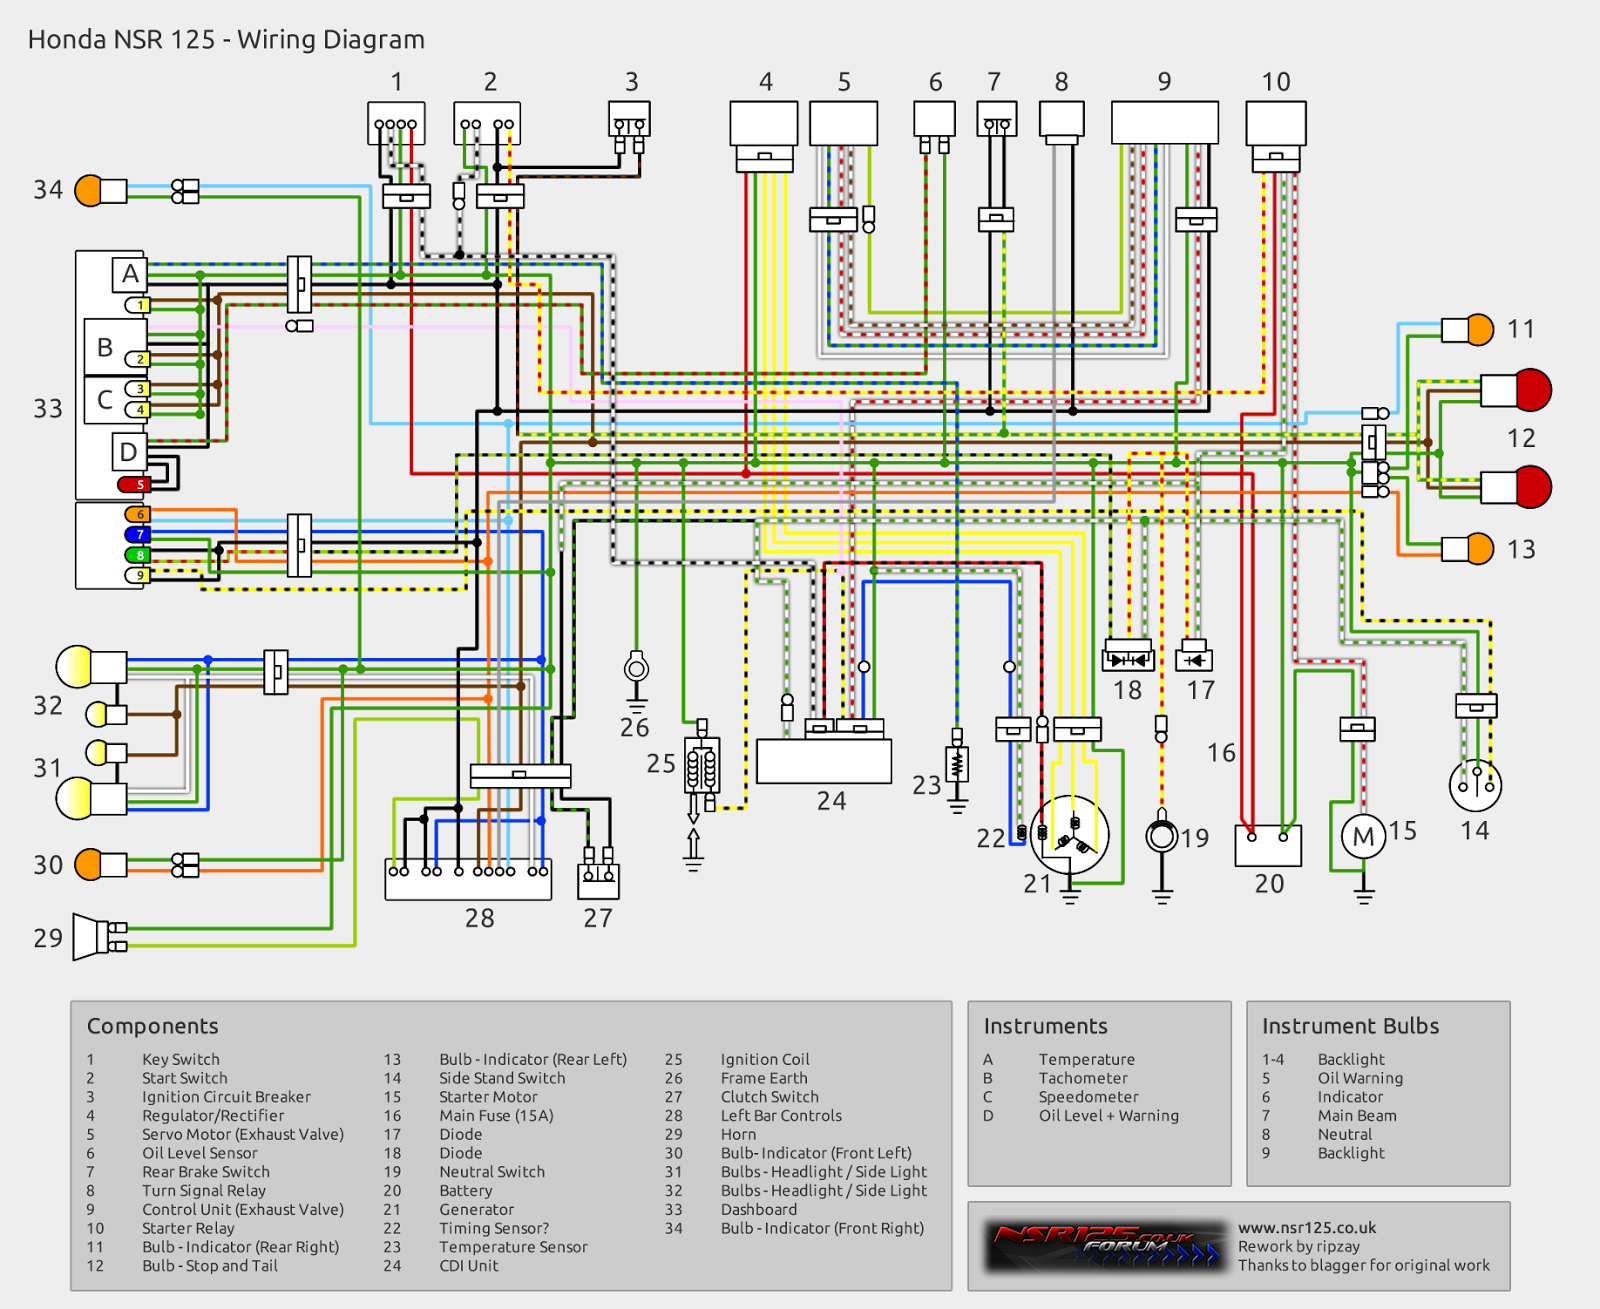 hight resolution of yamaha r6 tail light wiring diagram suzuki c50 wiring 2003 yamaha r1 wiring diagram 2000 yamaha r1 service manual